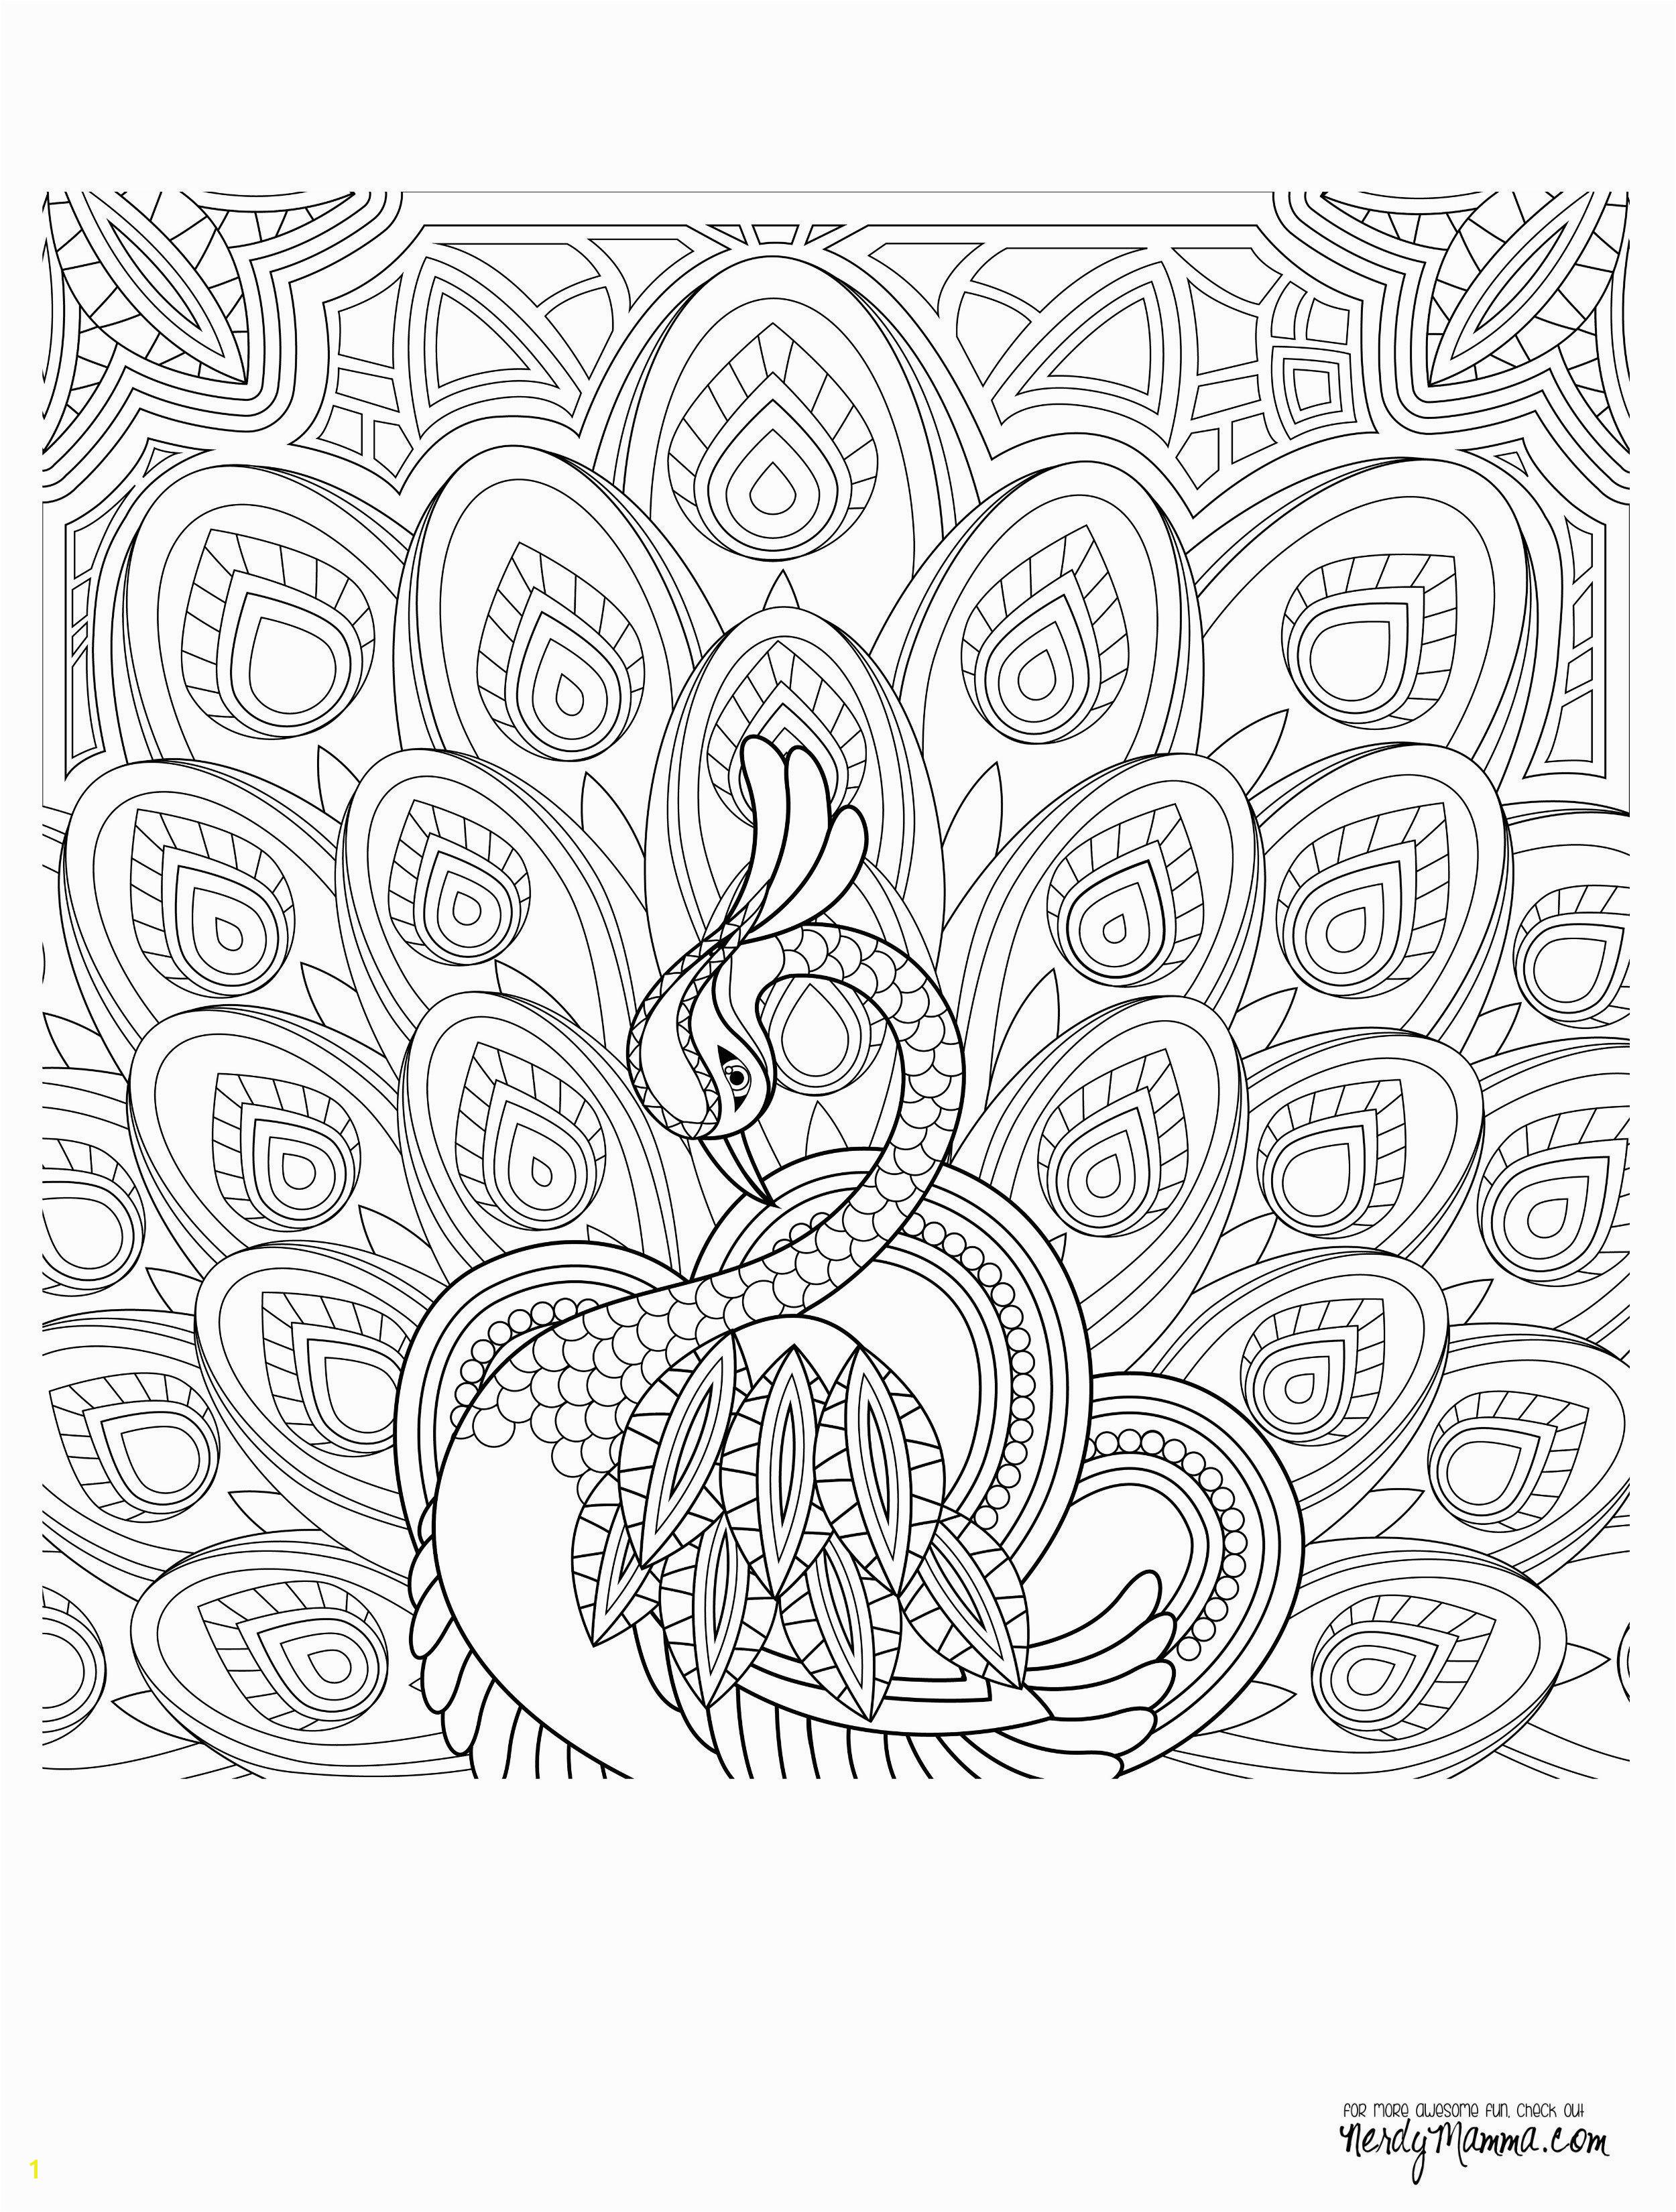 Peacock Feather Coloring pages colouring adult detailed advanced printable Kleuren voor volwassenen coloriage pour adulte anti stress kleurplaat voor